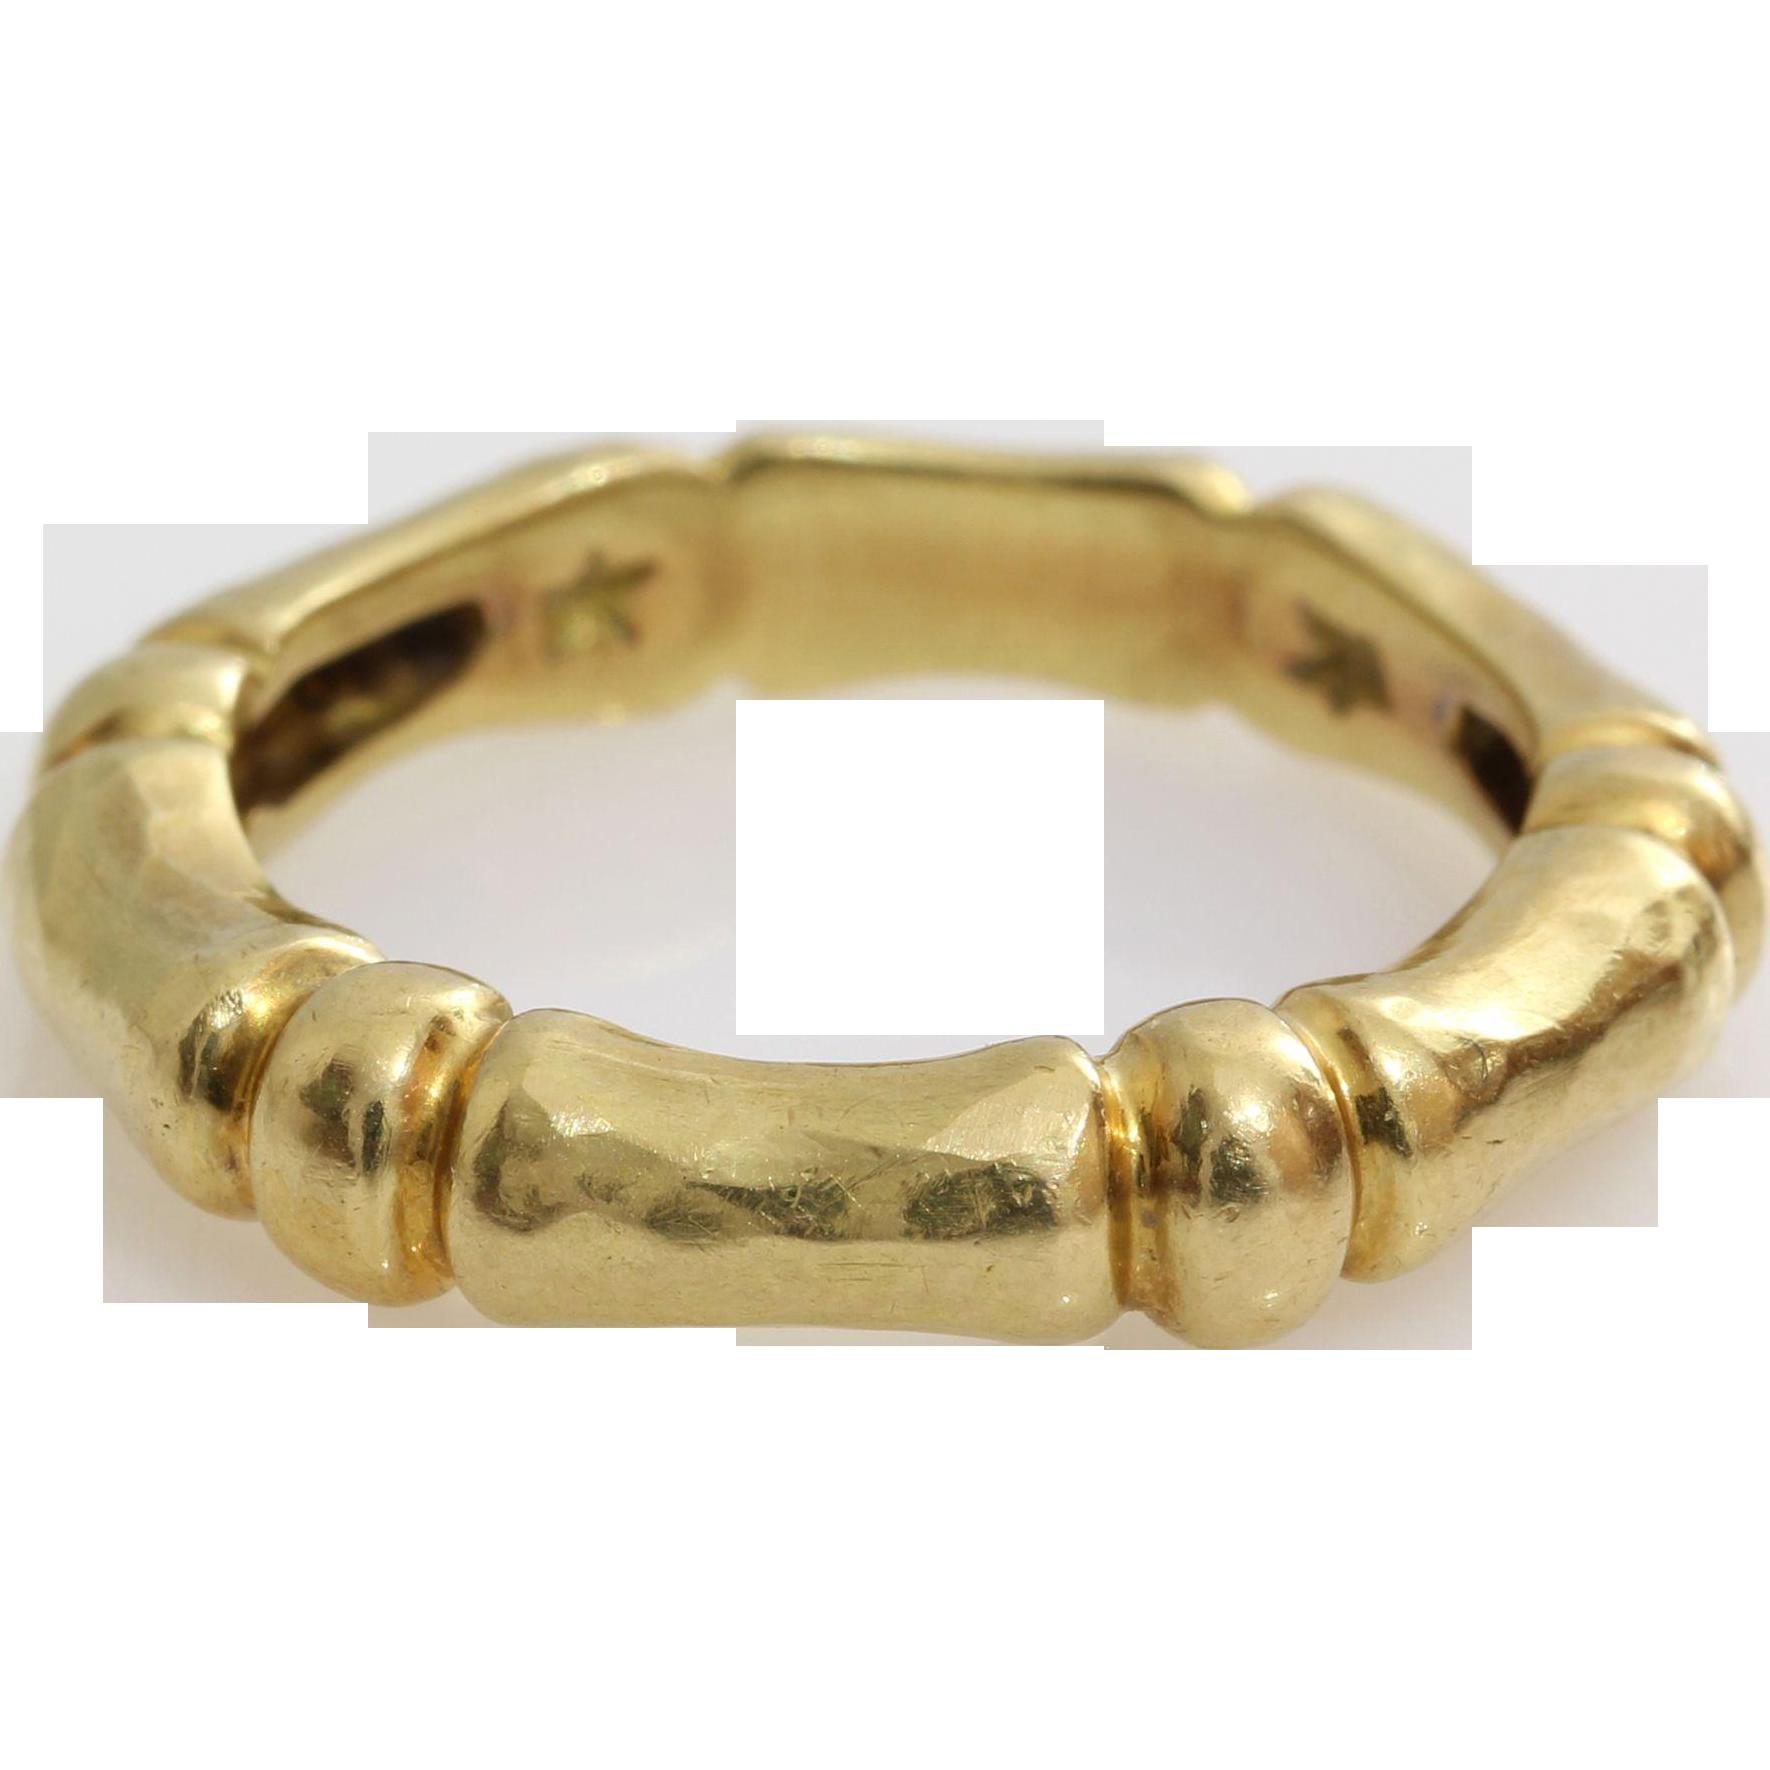 vintage wedding ring 18k yellow gold marriage band hern